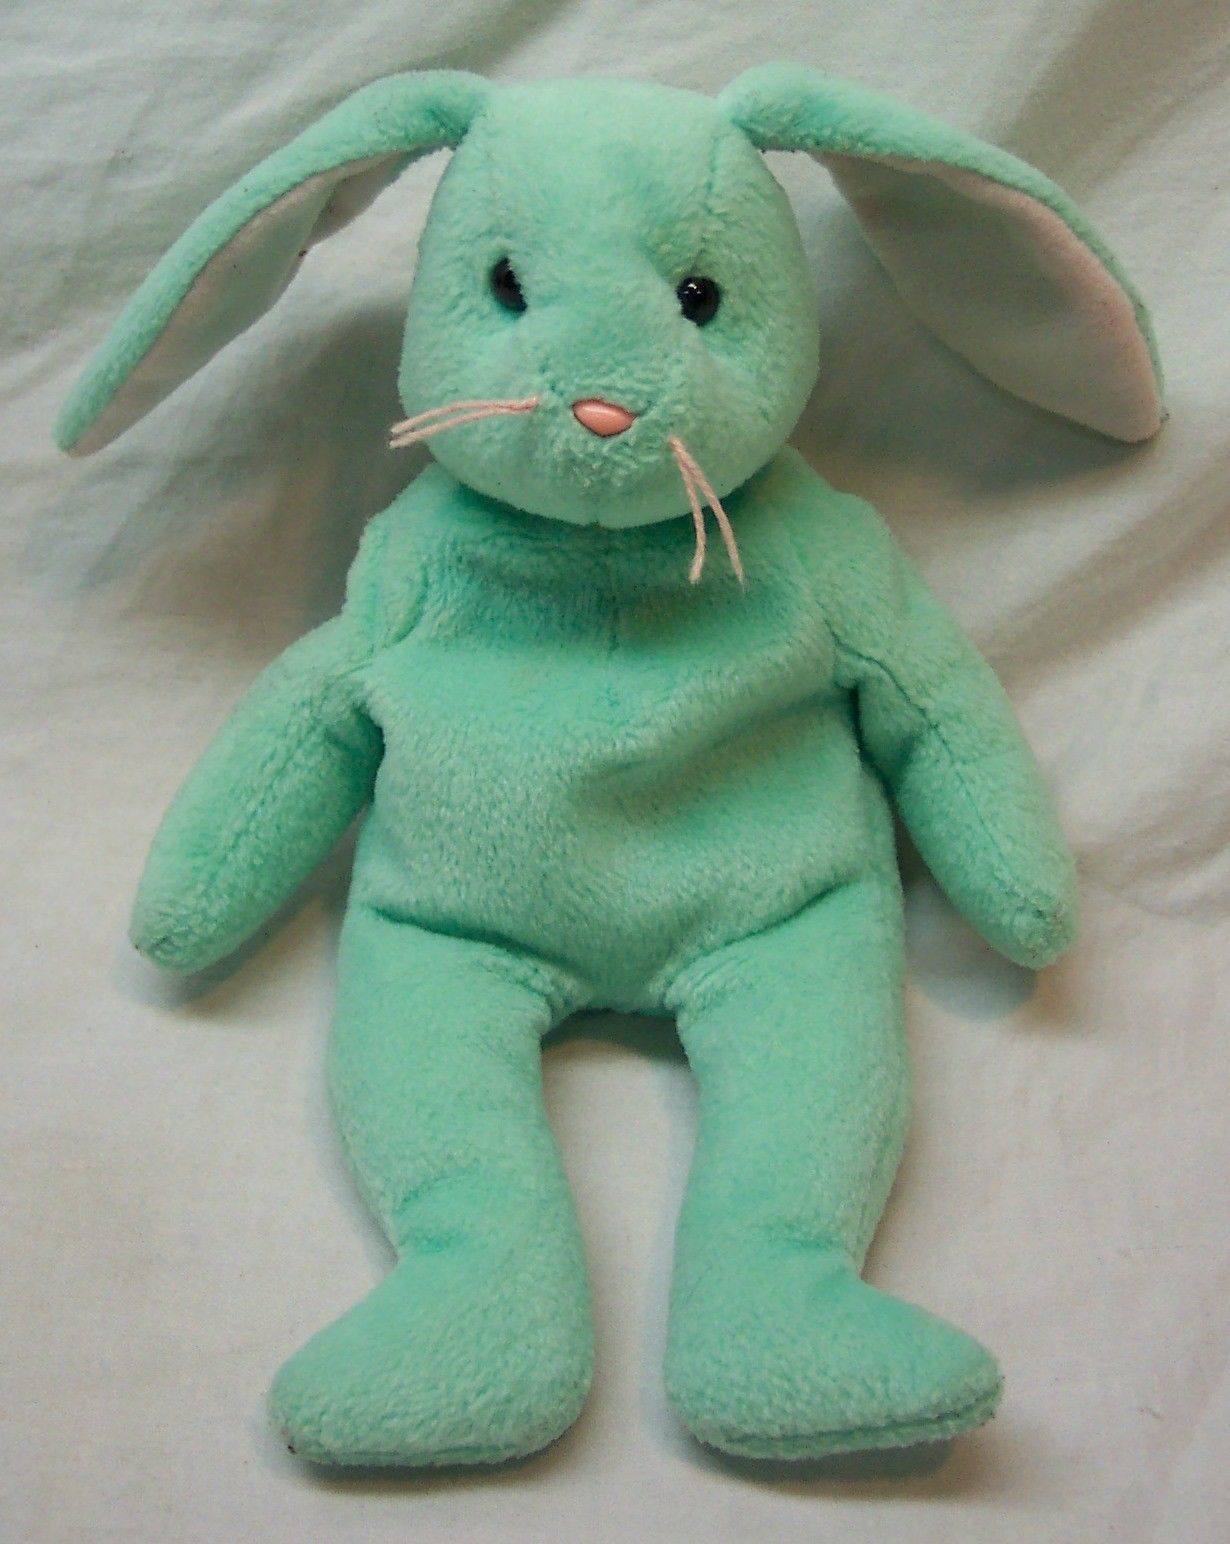 b40558b4183 Ty Beanie Baby Mint Green Hippity Bunny 8